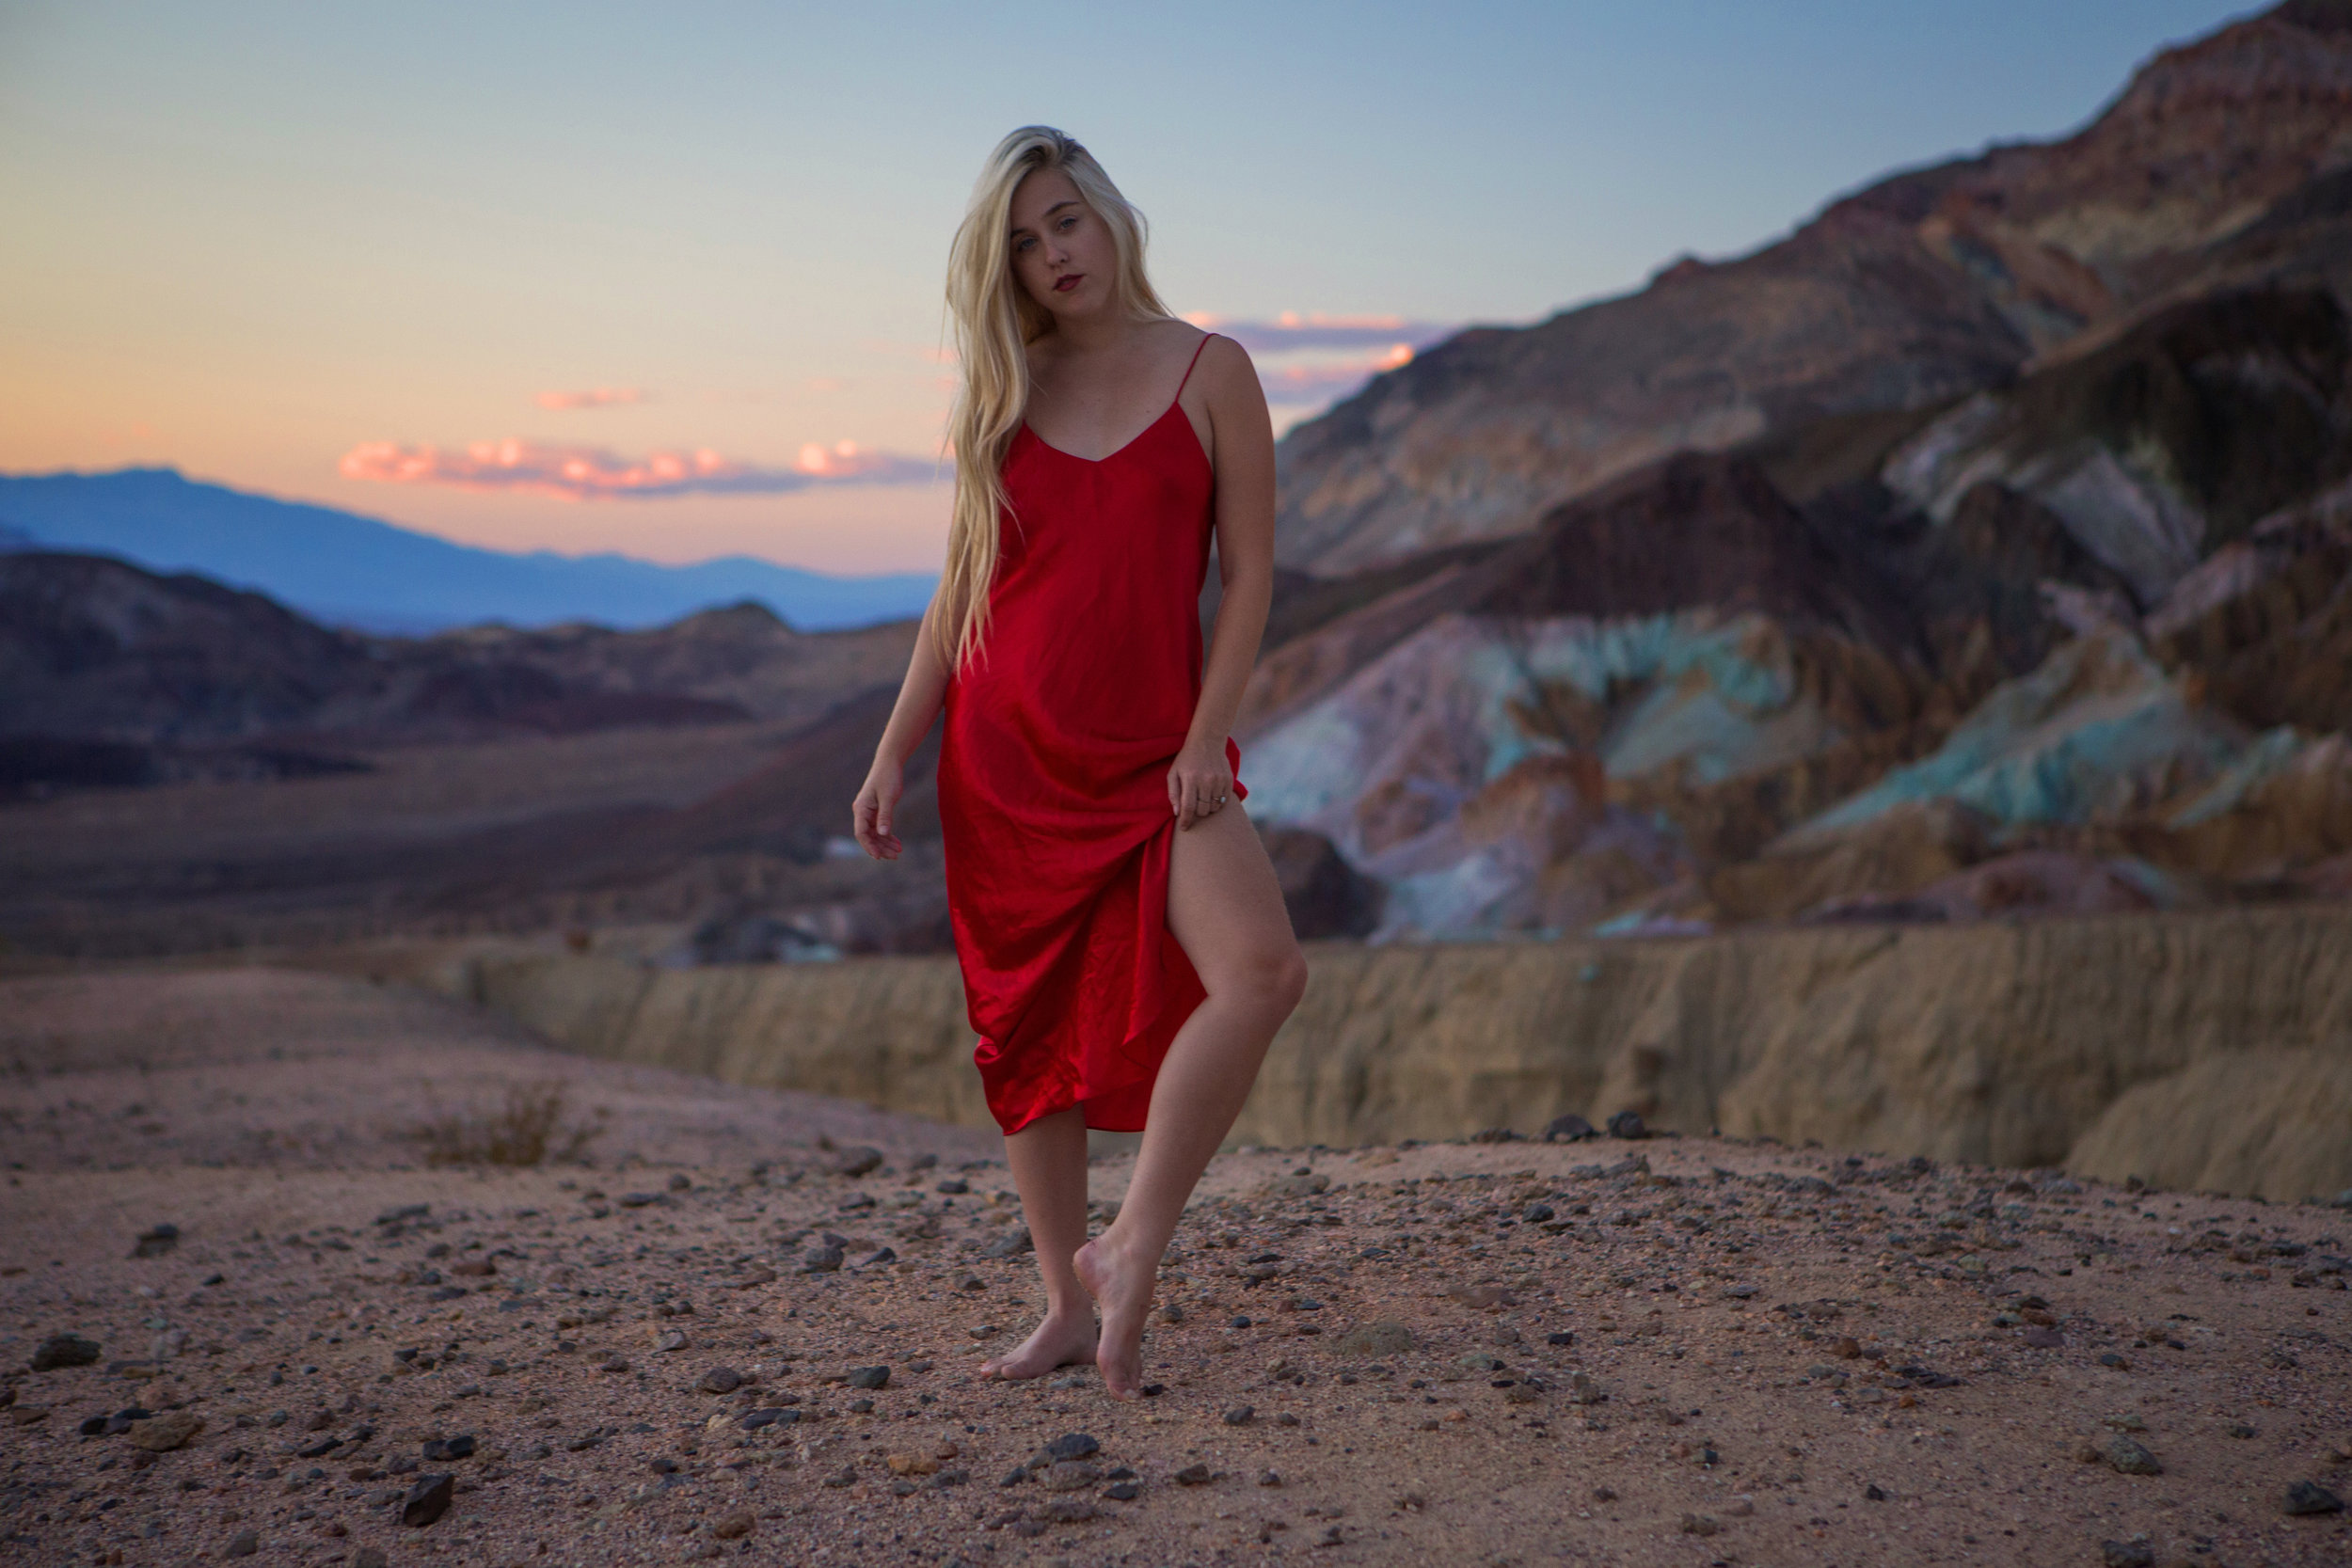 AstroBandit_JordanRose_DeathValley_ArtistsPalette_RedSilk_Sunset_Dancing_1.jpg